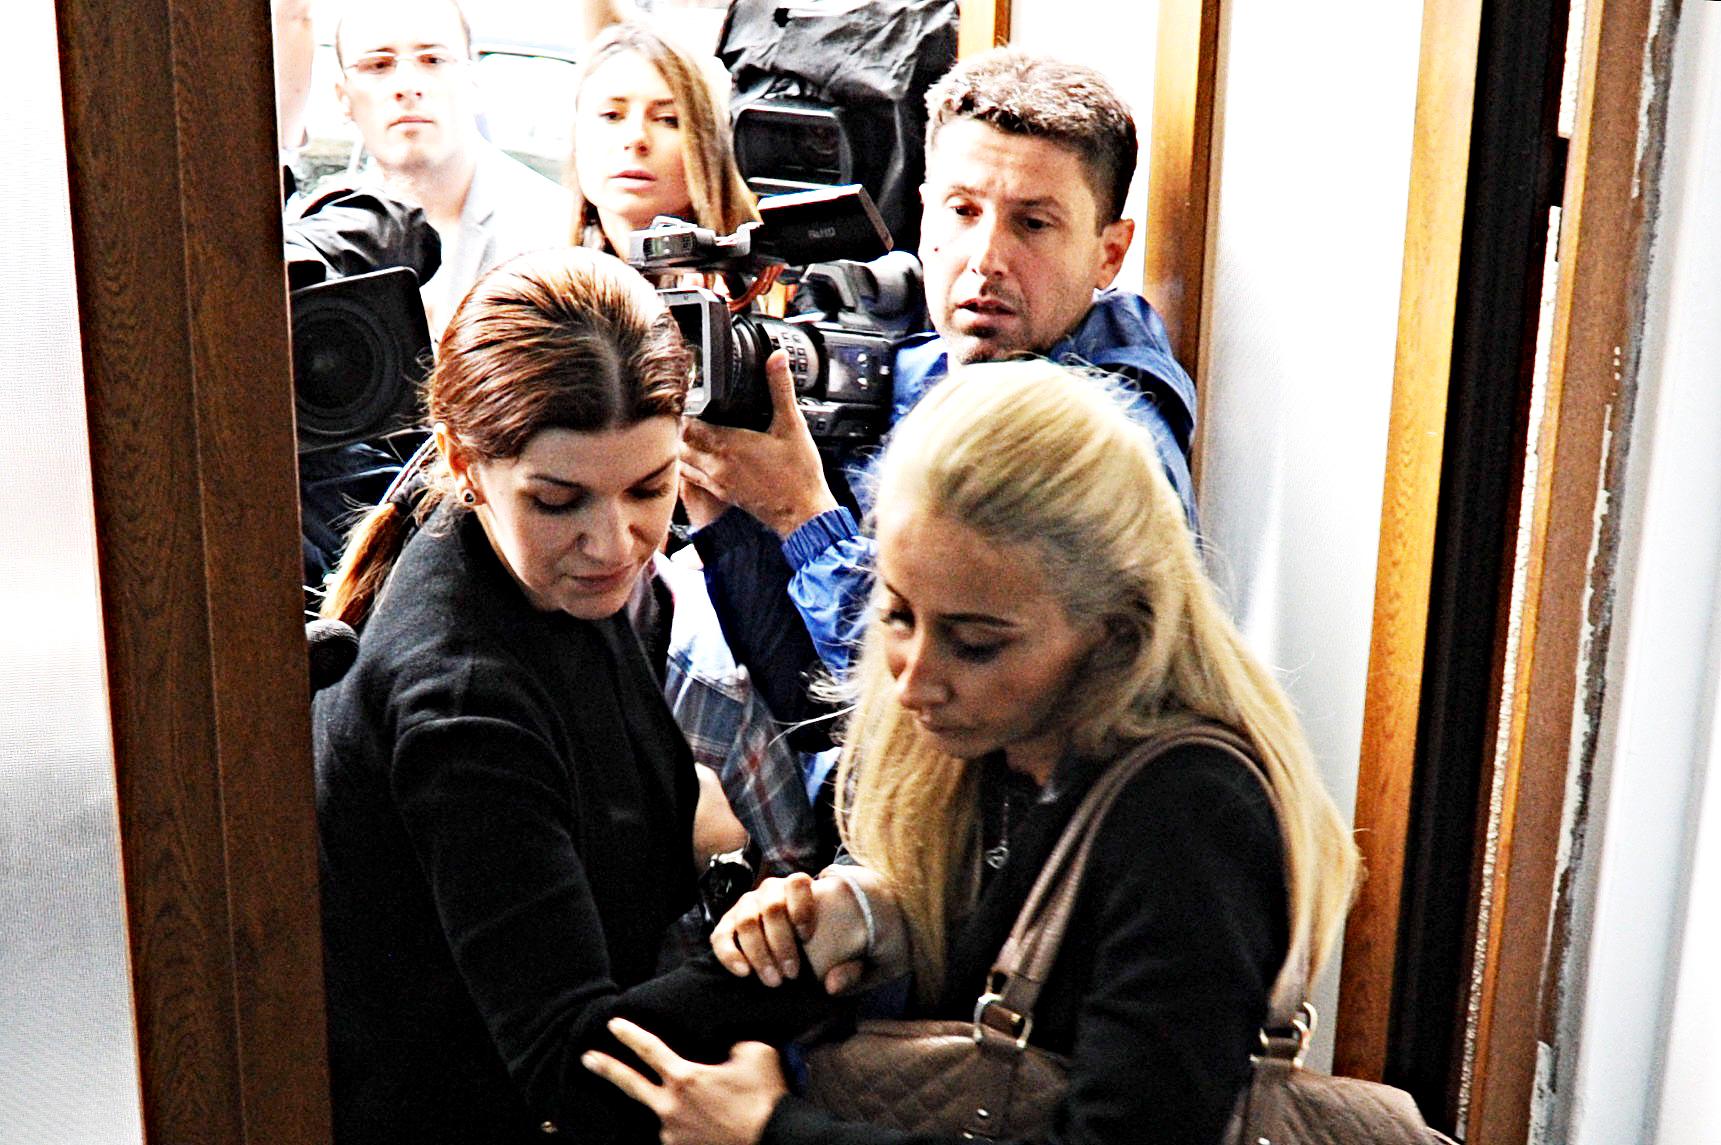 Nou dosar penal in cazul Hexi Pharma. Iubita lui Dan Condrea, Iuliana Ochinciuc, a fost pusa sub urmarire penala